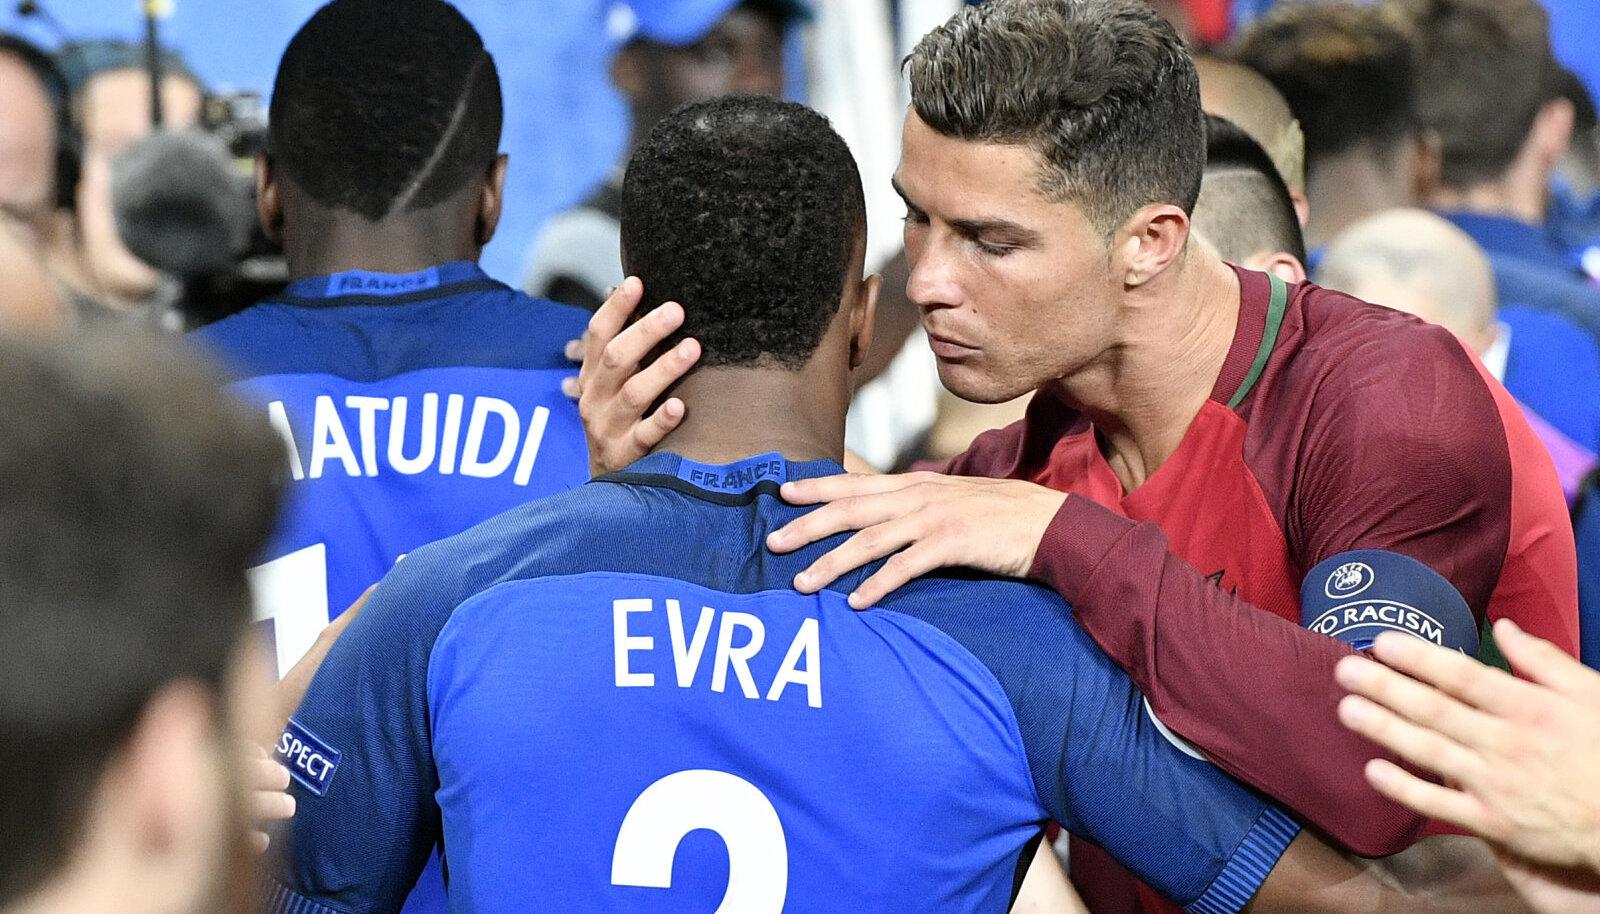 Patrice Evra ja Cristiano Ronaldo